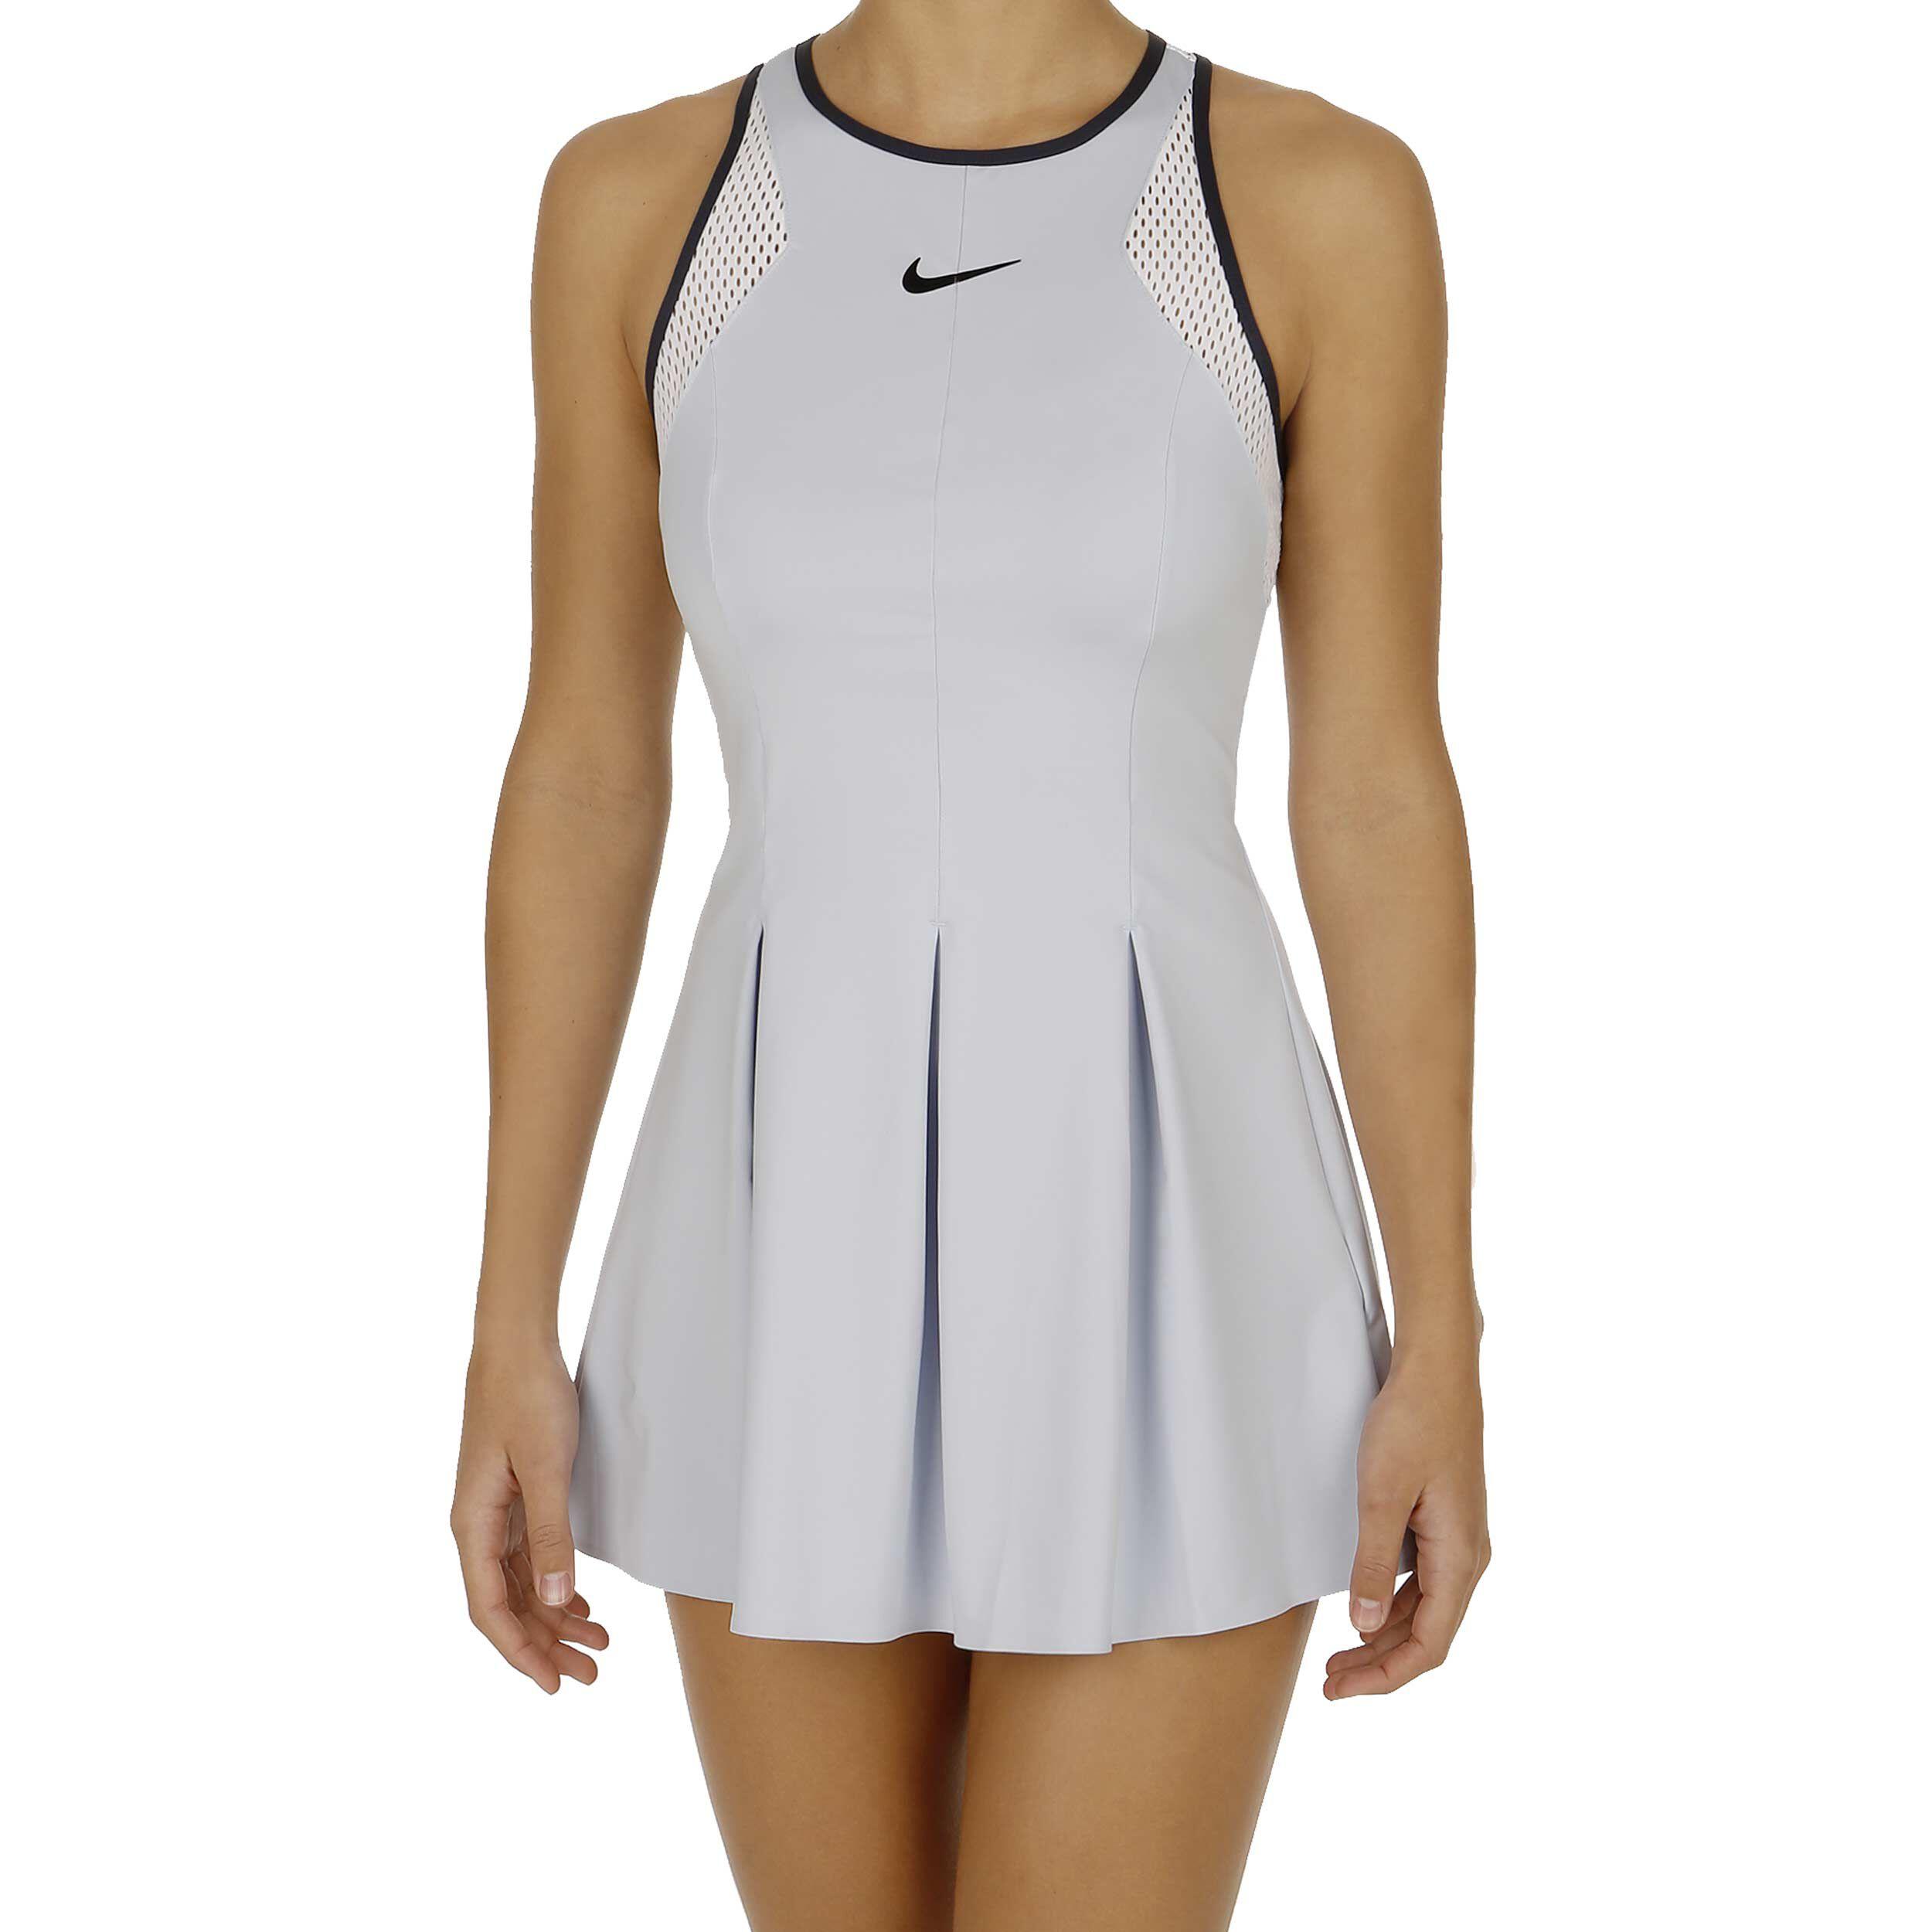 Mujeres Sharapova Premier Nike Maria ClaroBlanco Vestido Azul gY7mIybf6v